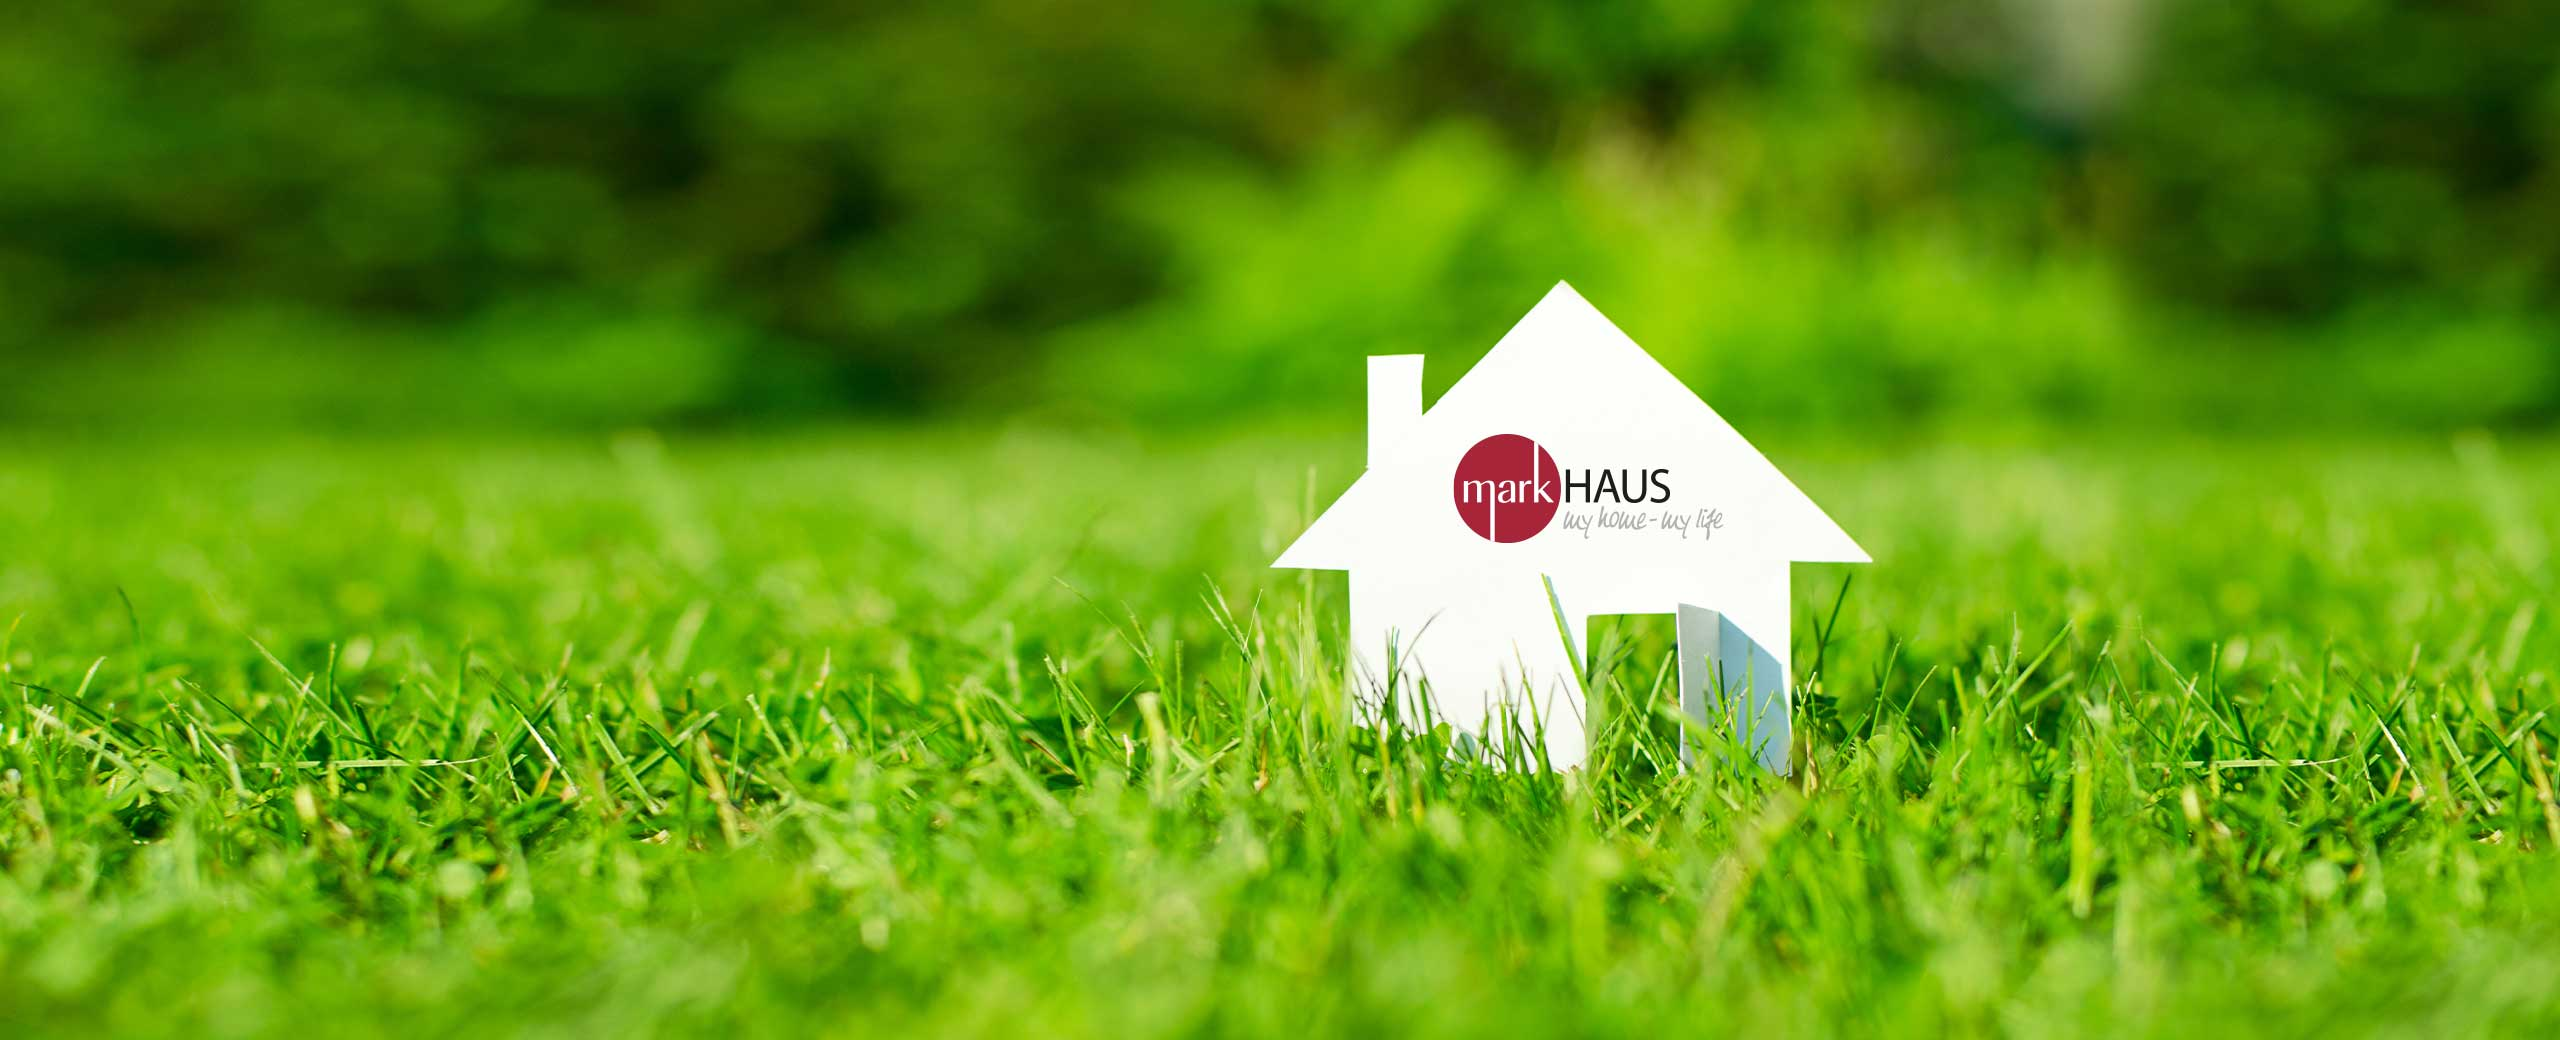 markhaus haus bauen eco